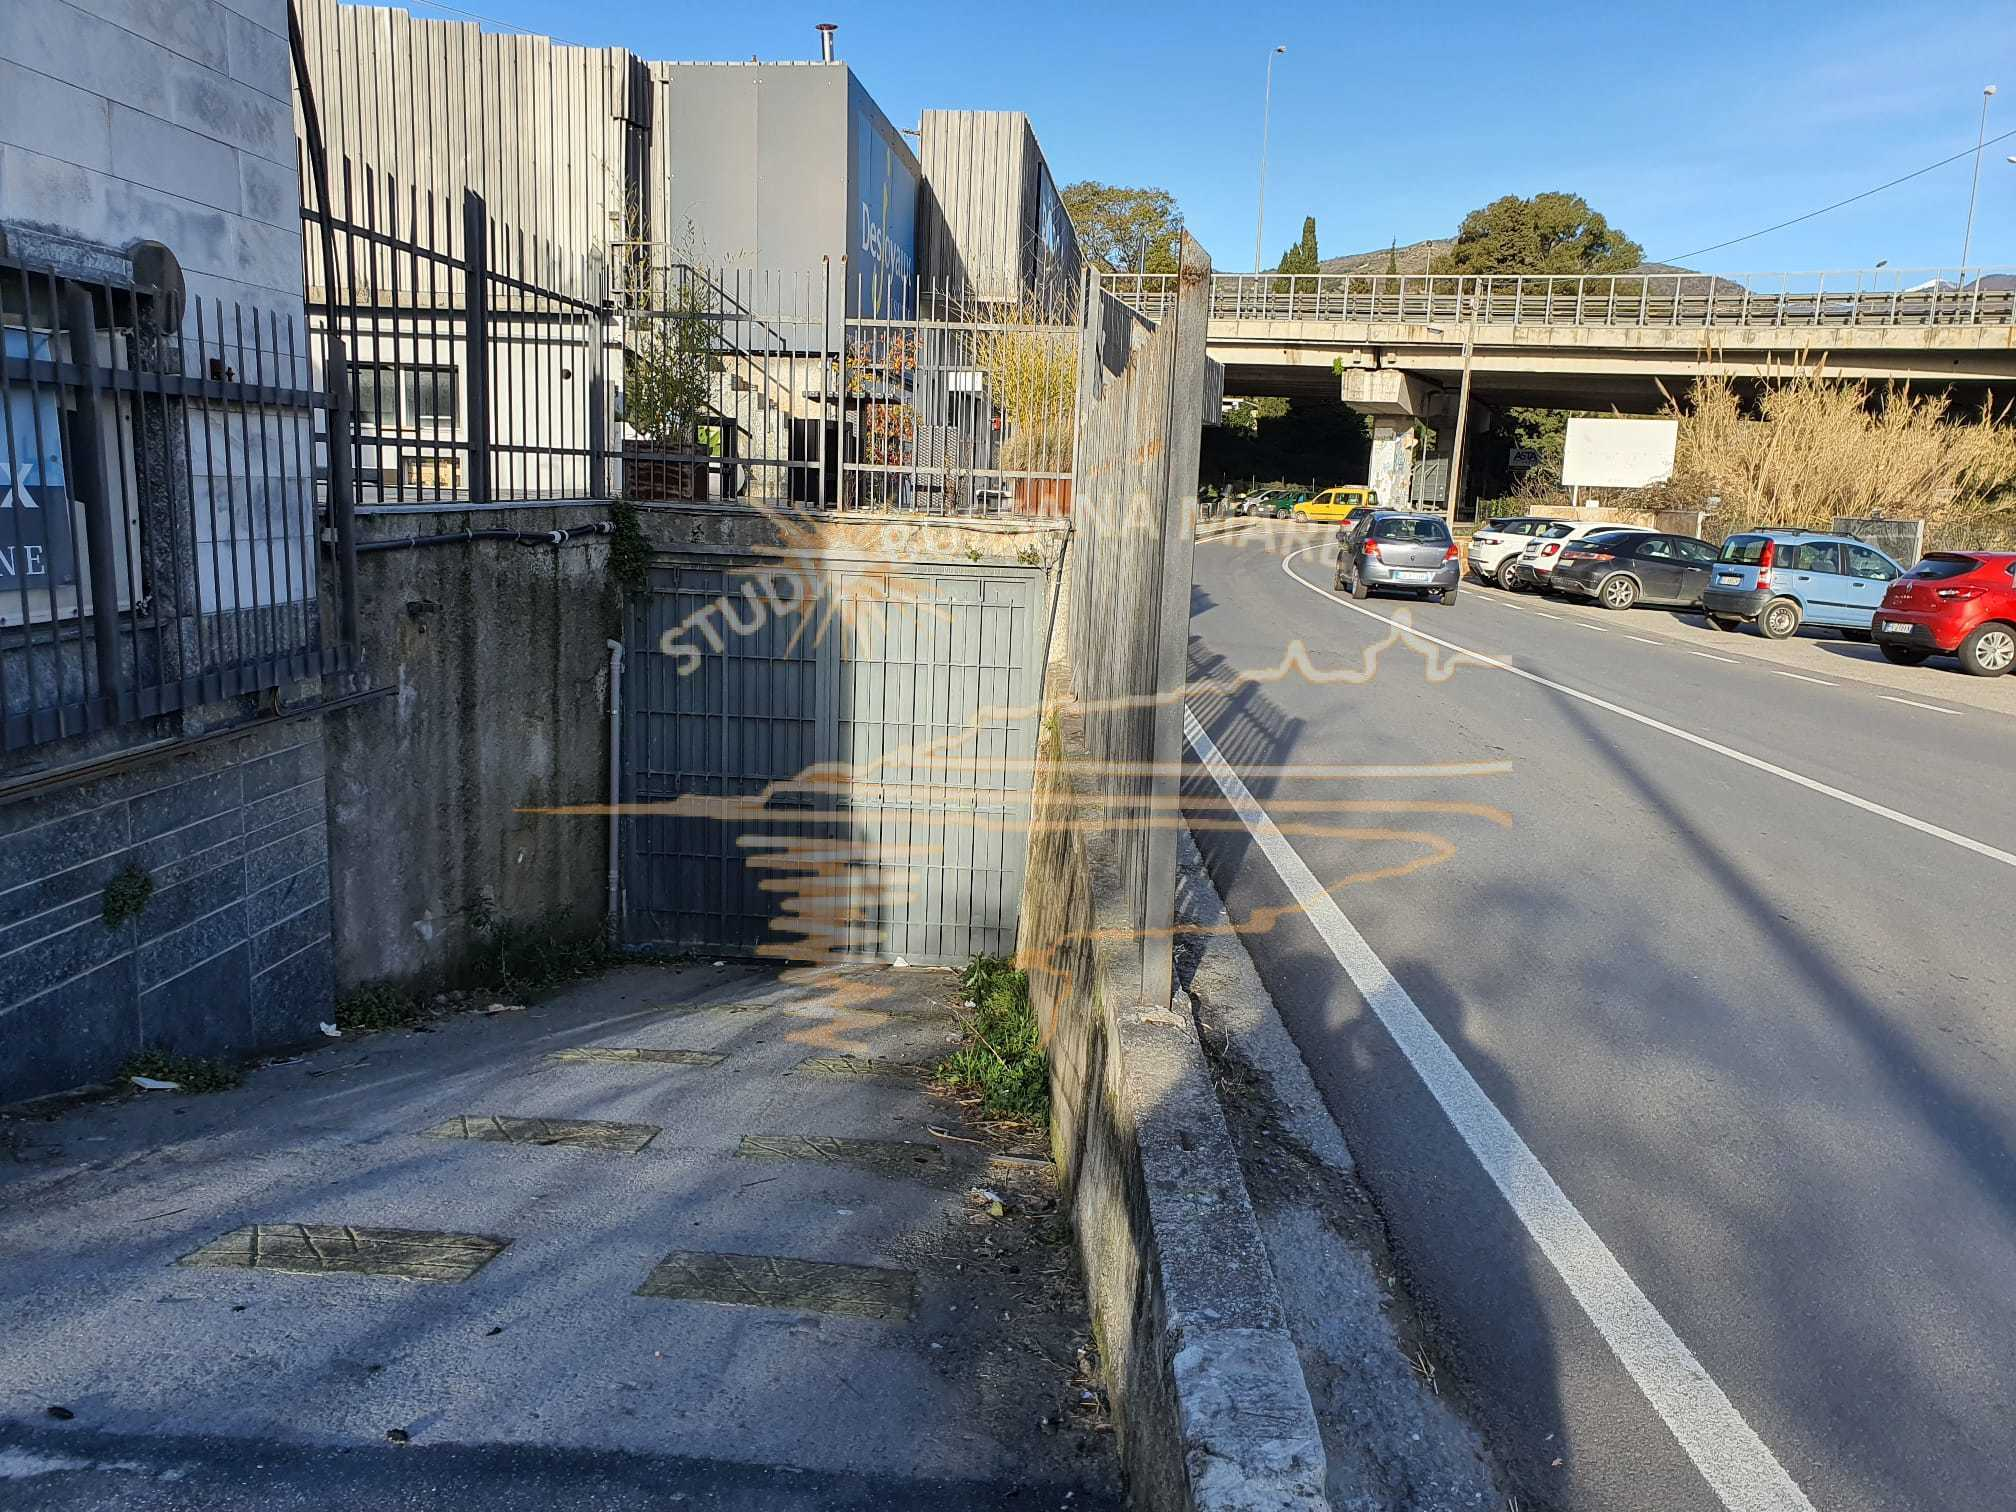 Locale commerciale - Sanremo